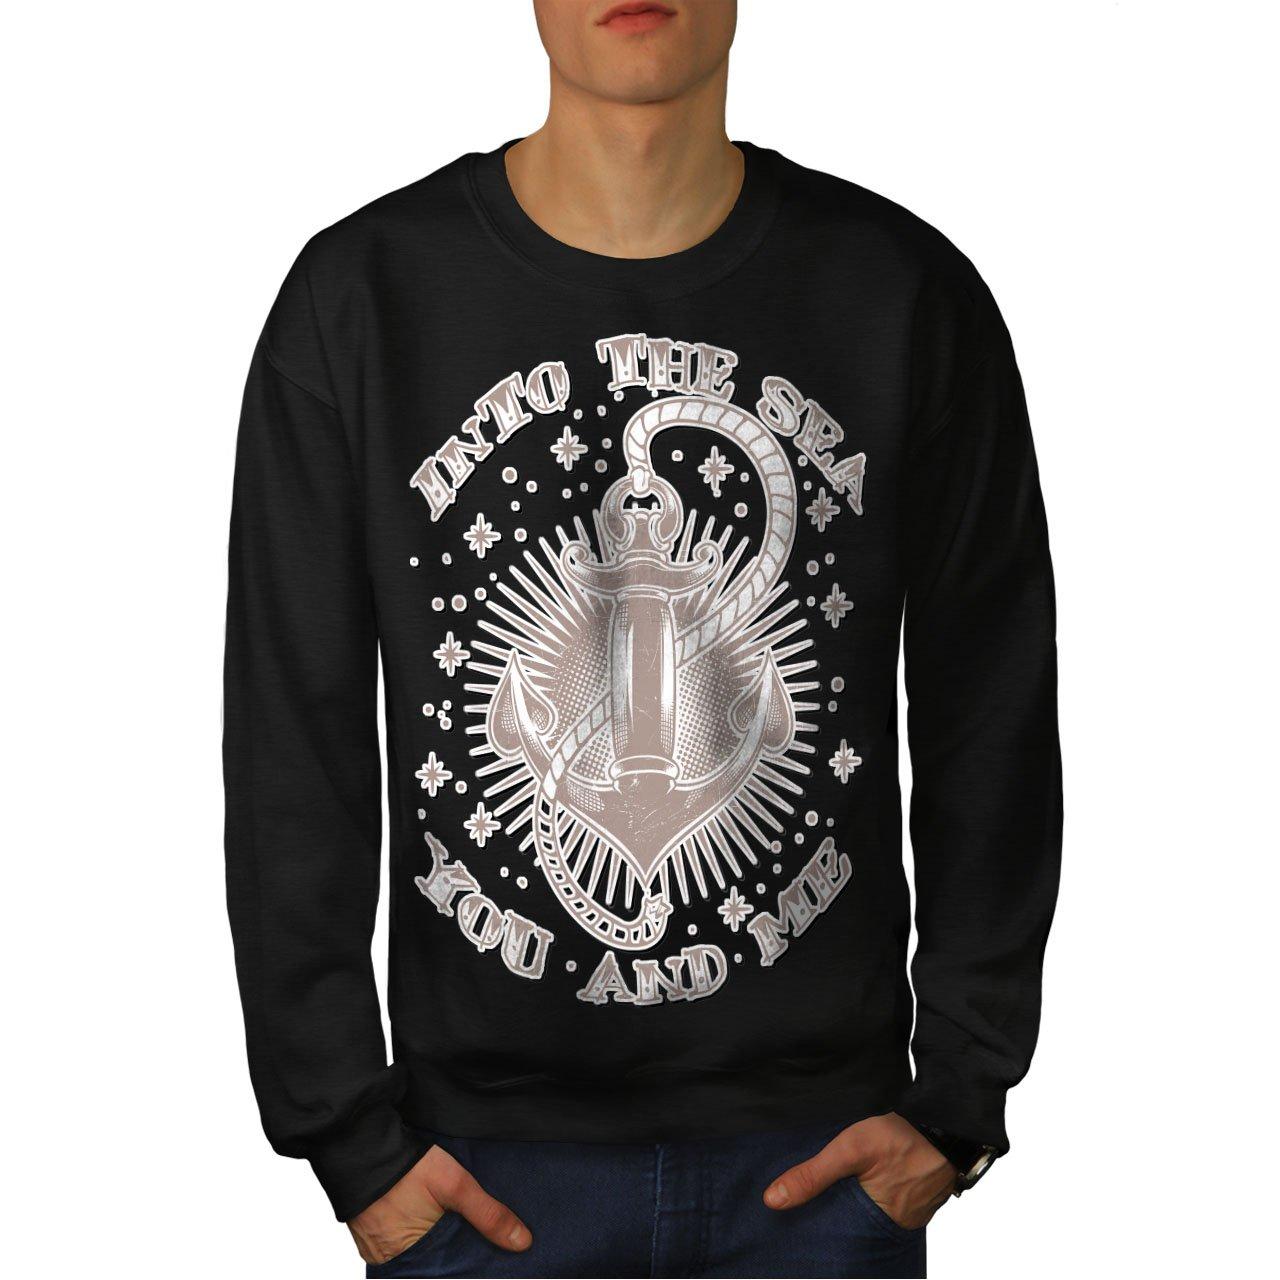 Anchorage Casual Jumper wellcoda Into Sea Together Mens Sweatshirt